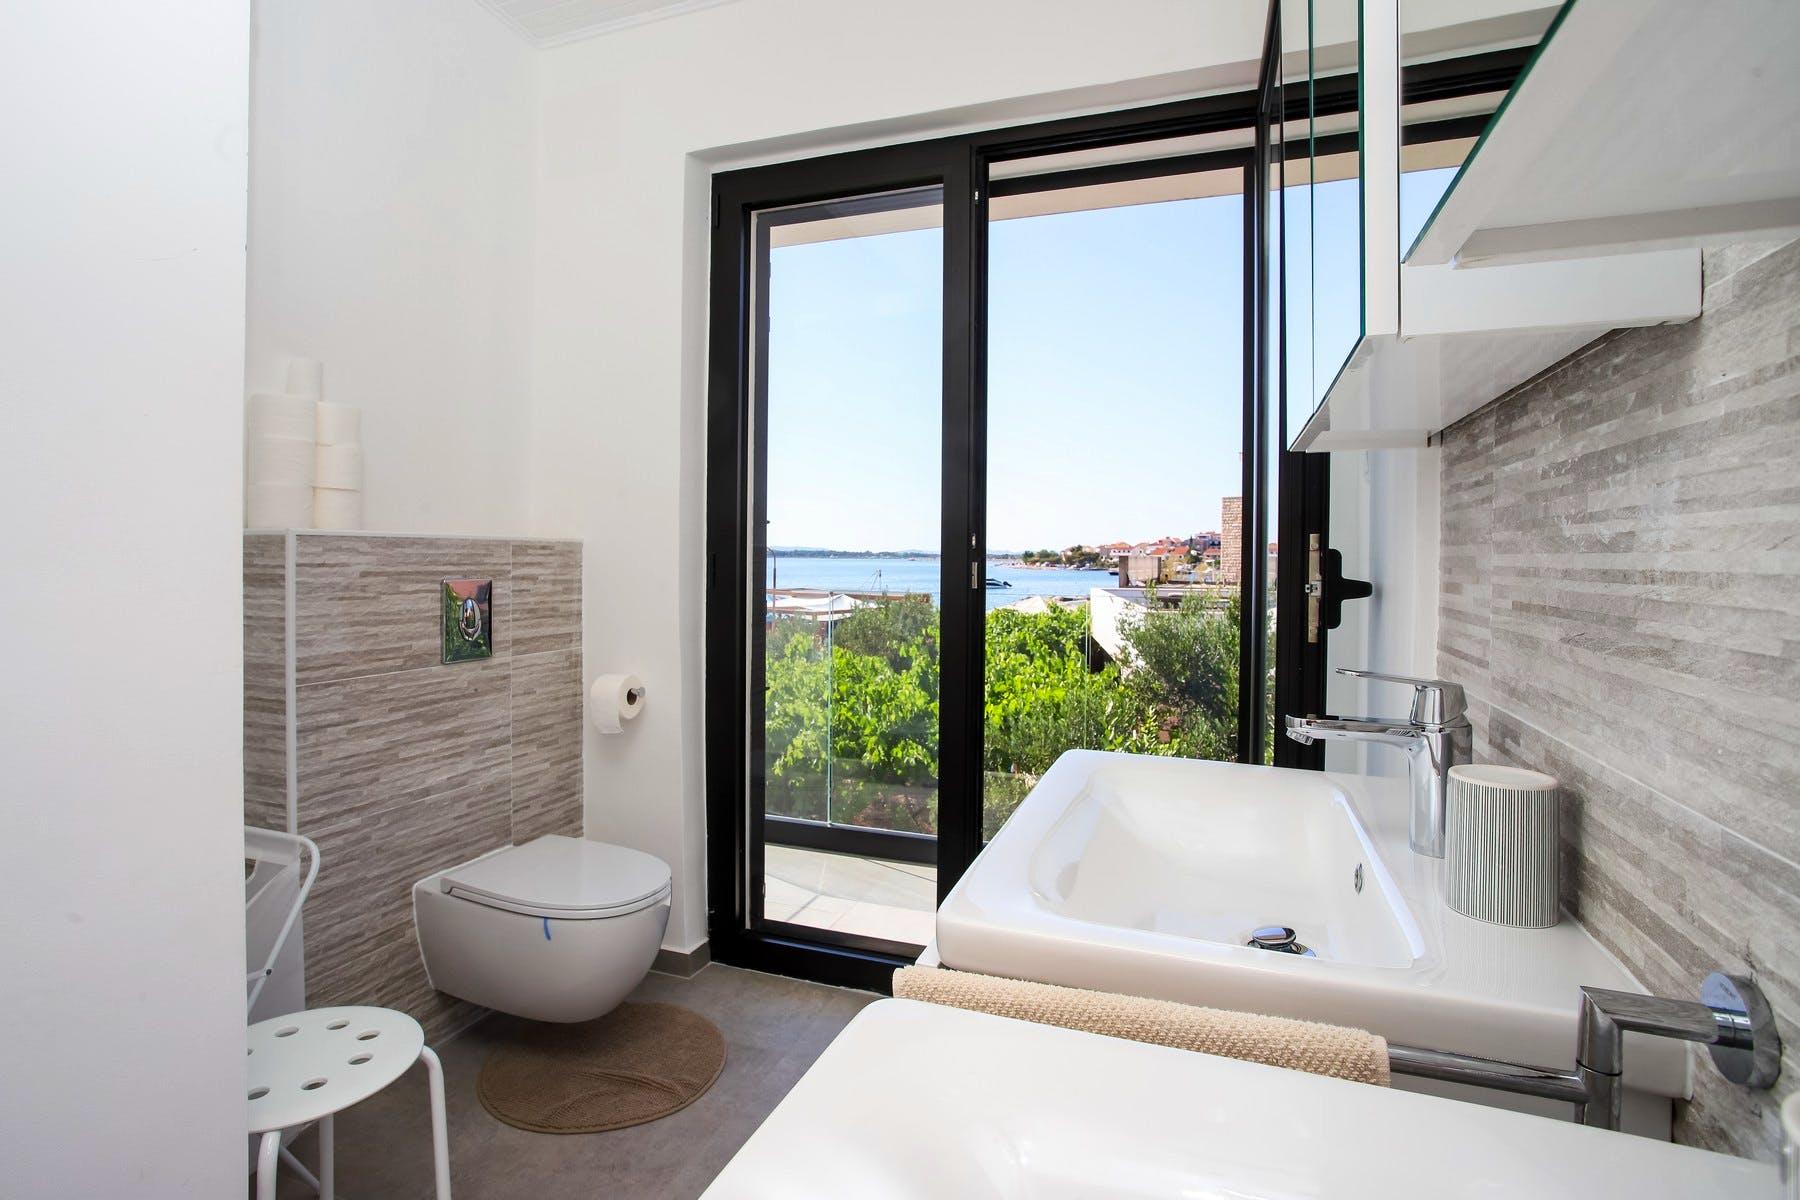 Modern bathroom with sea view